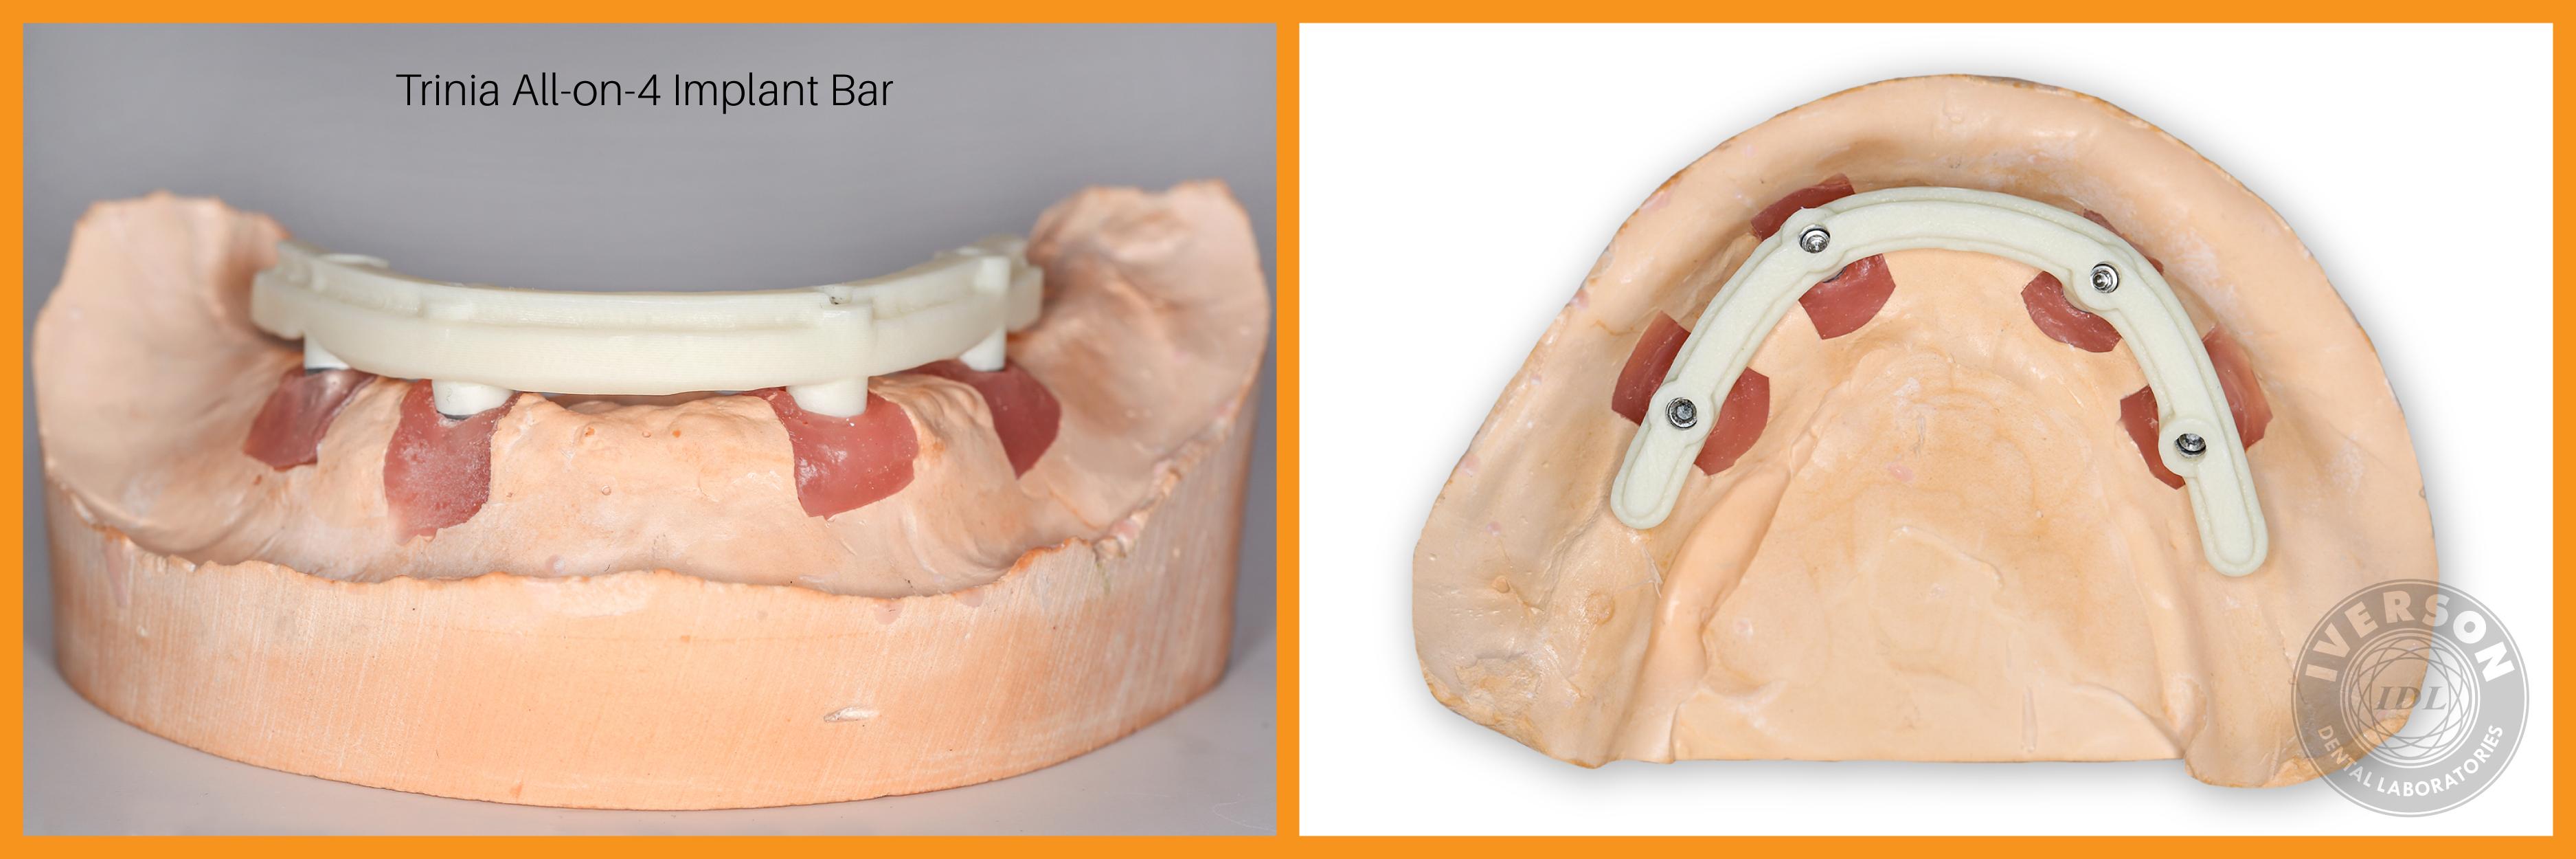 Trinia metal-free implant bar on dental model